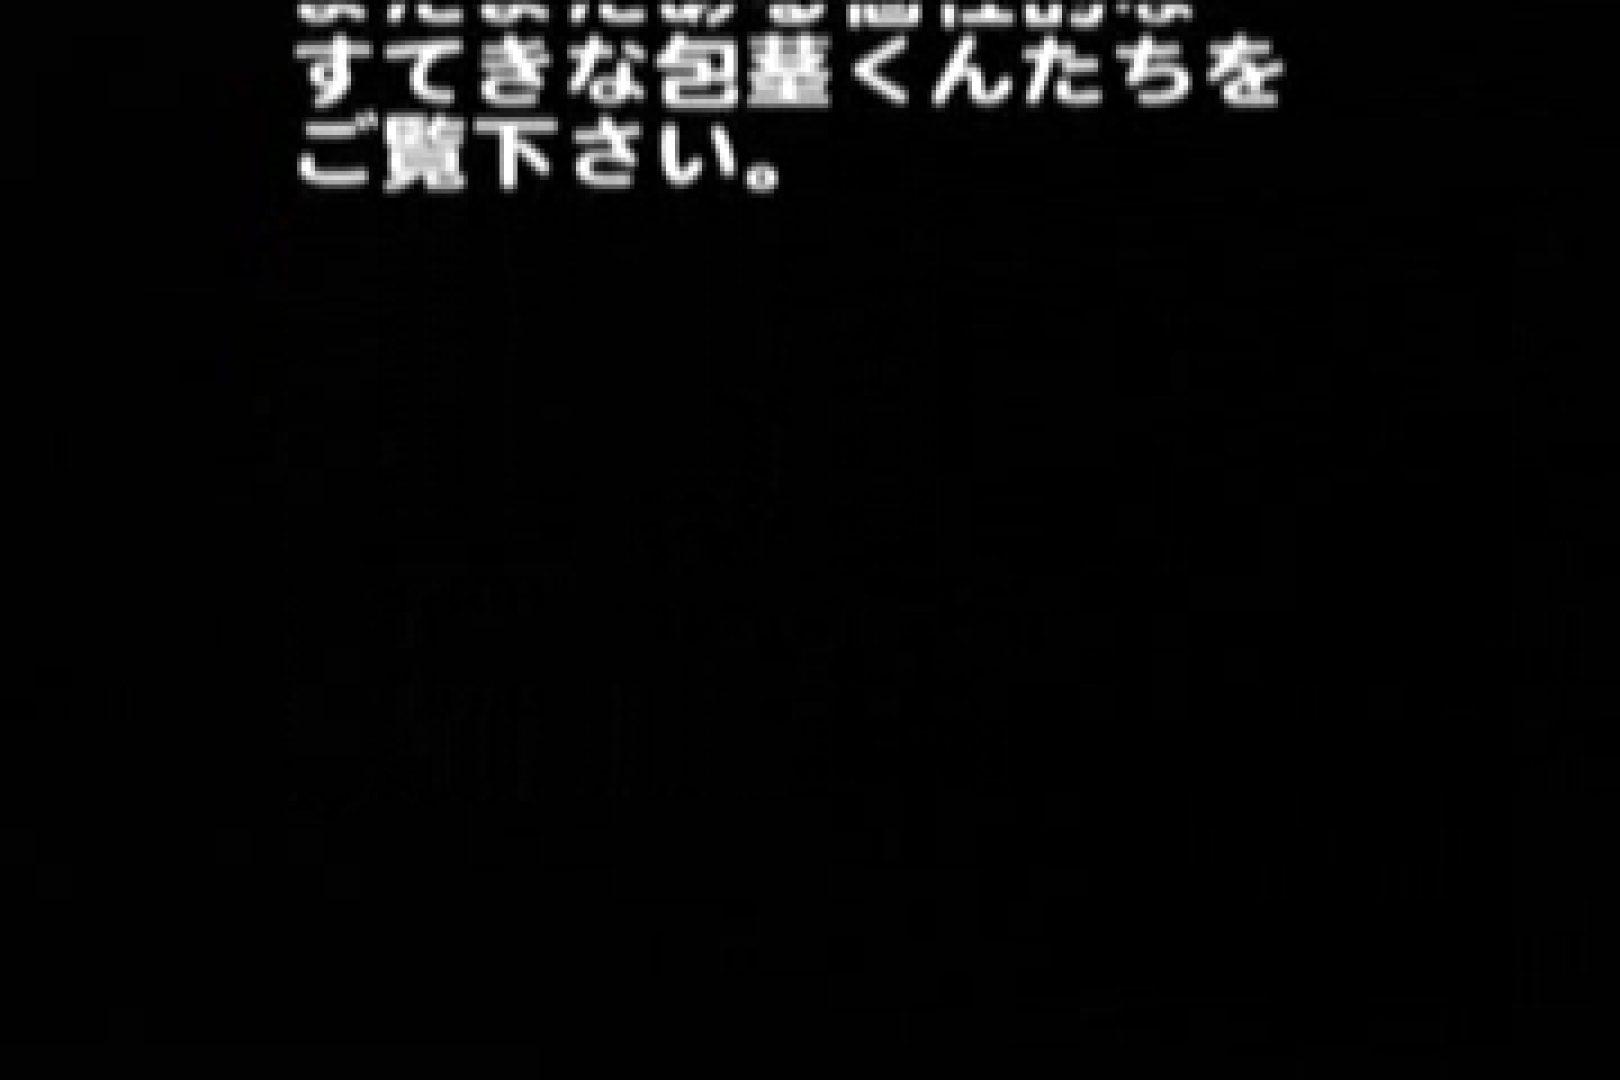 BABY FACEな包茎事情!!4FACEの快楽 射精シーン  7枚